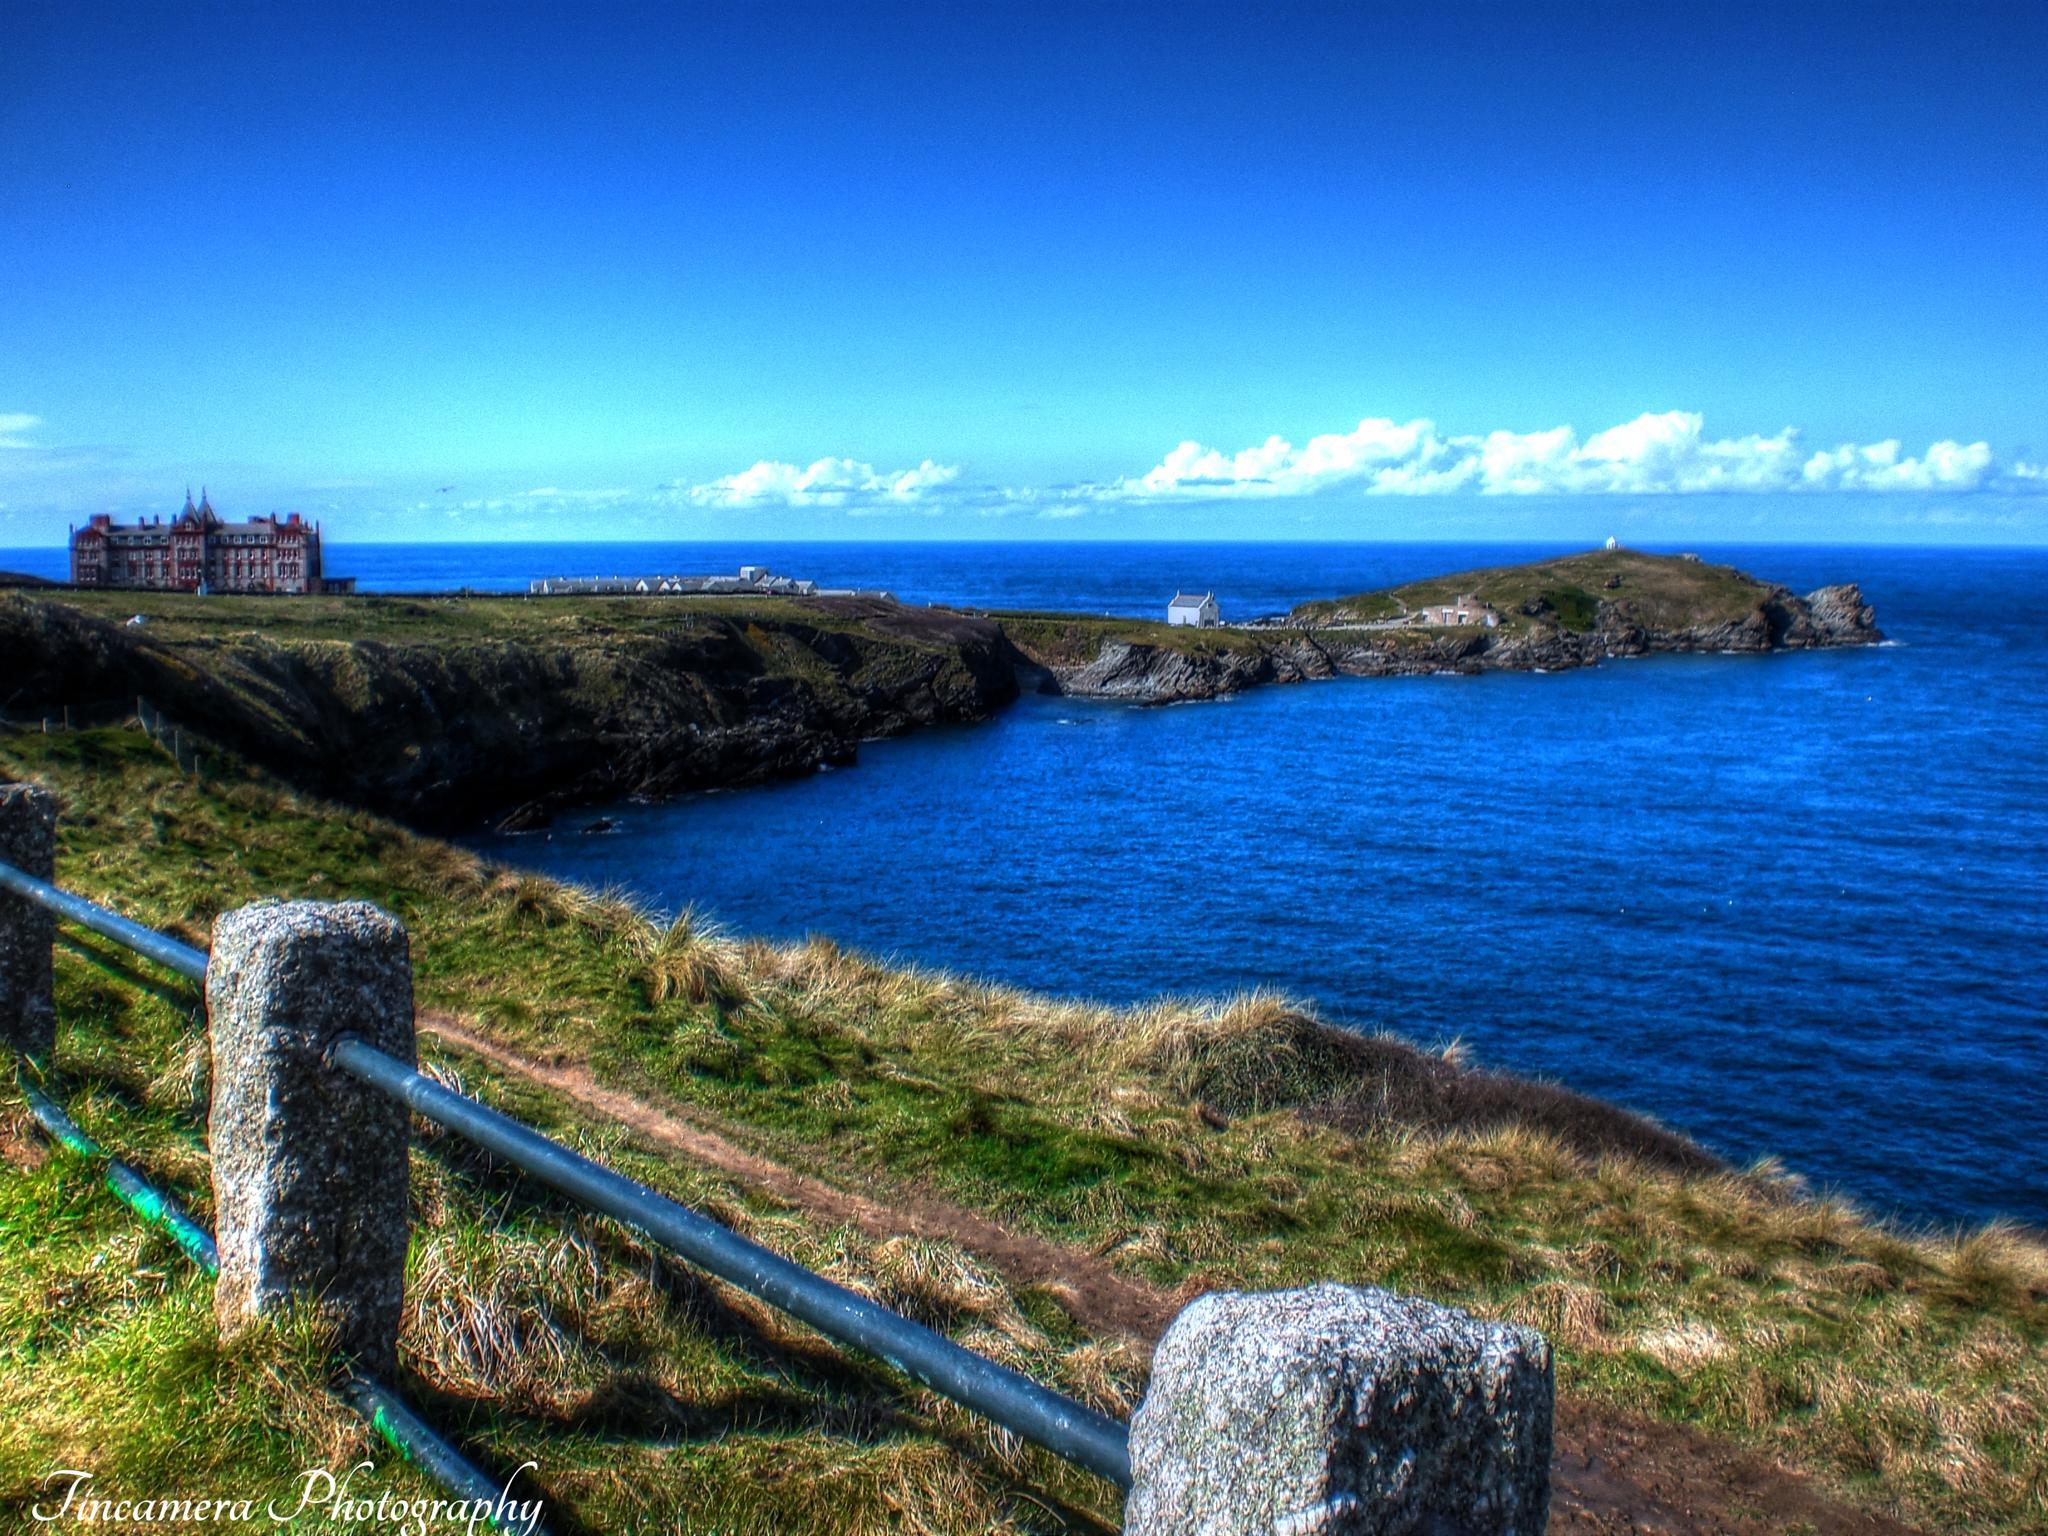 View to Headland, Newquay. by john jenkinson